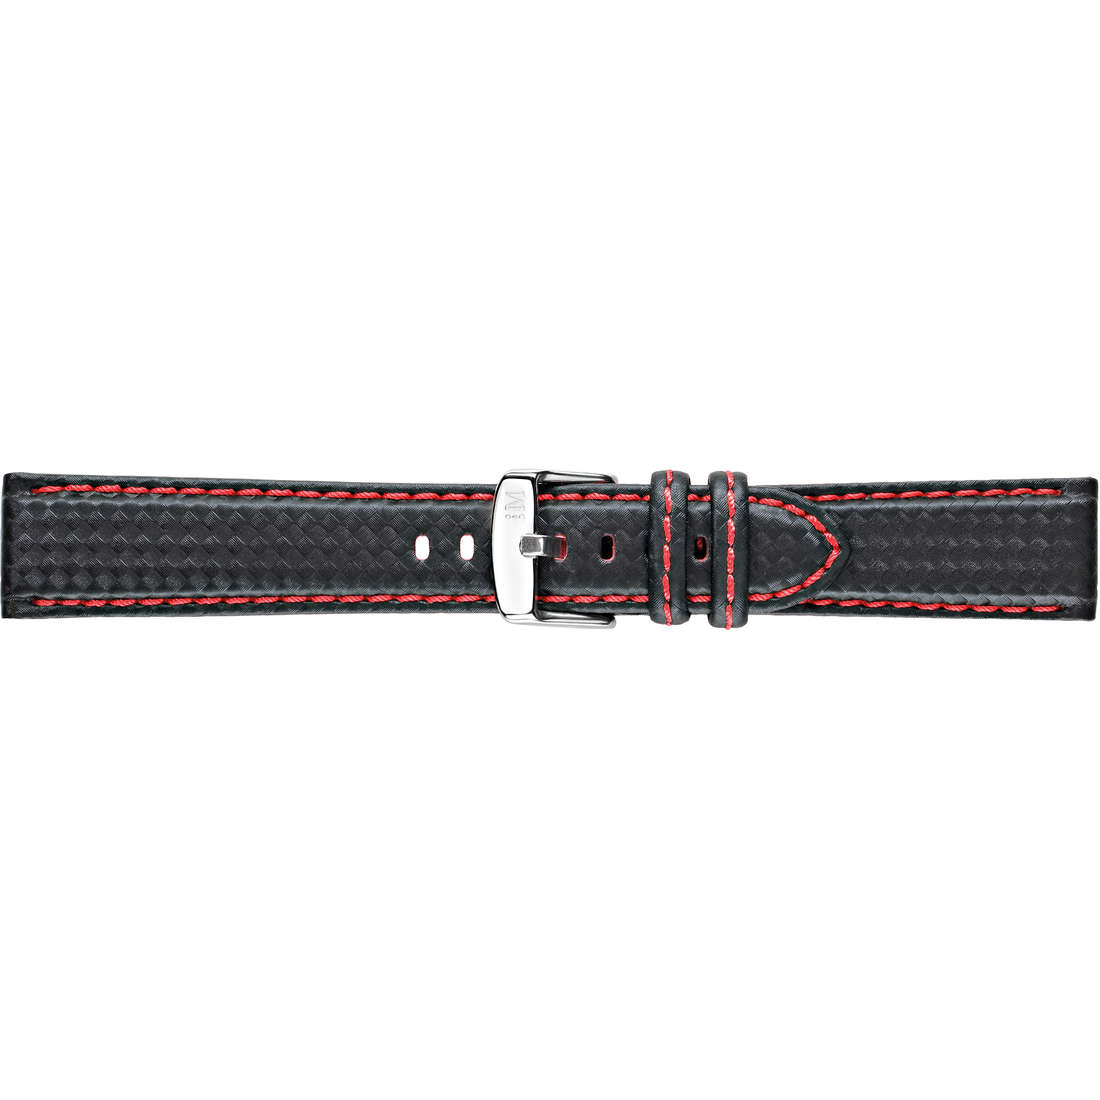 watch watch bands watch straps man Morellato Linea Sport A01U3586977883CR24